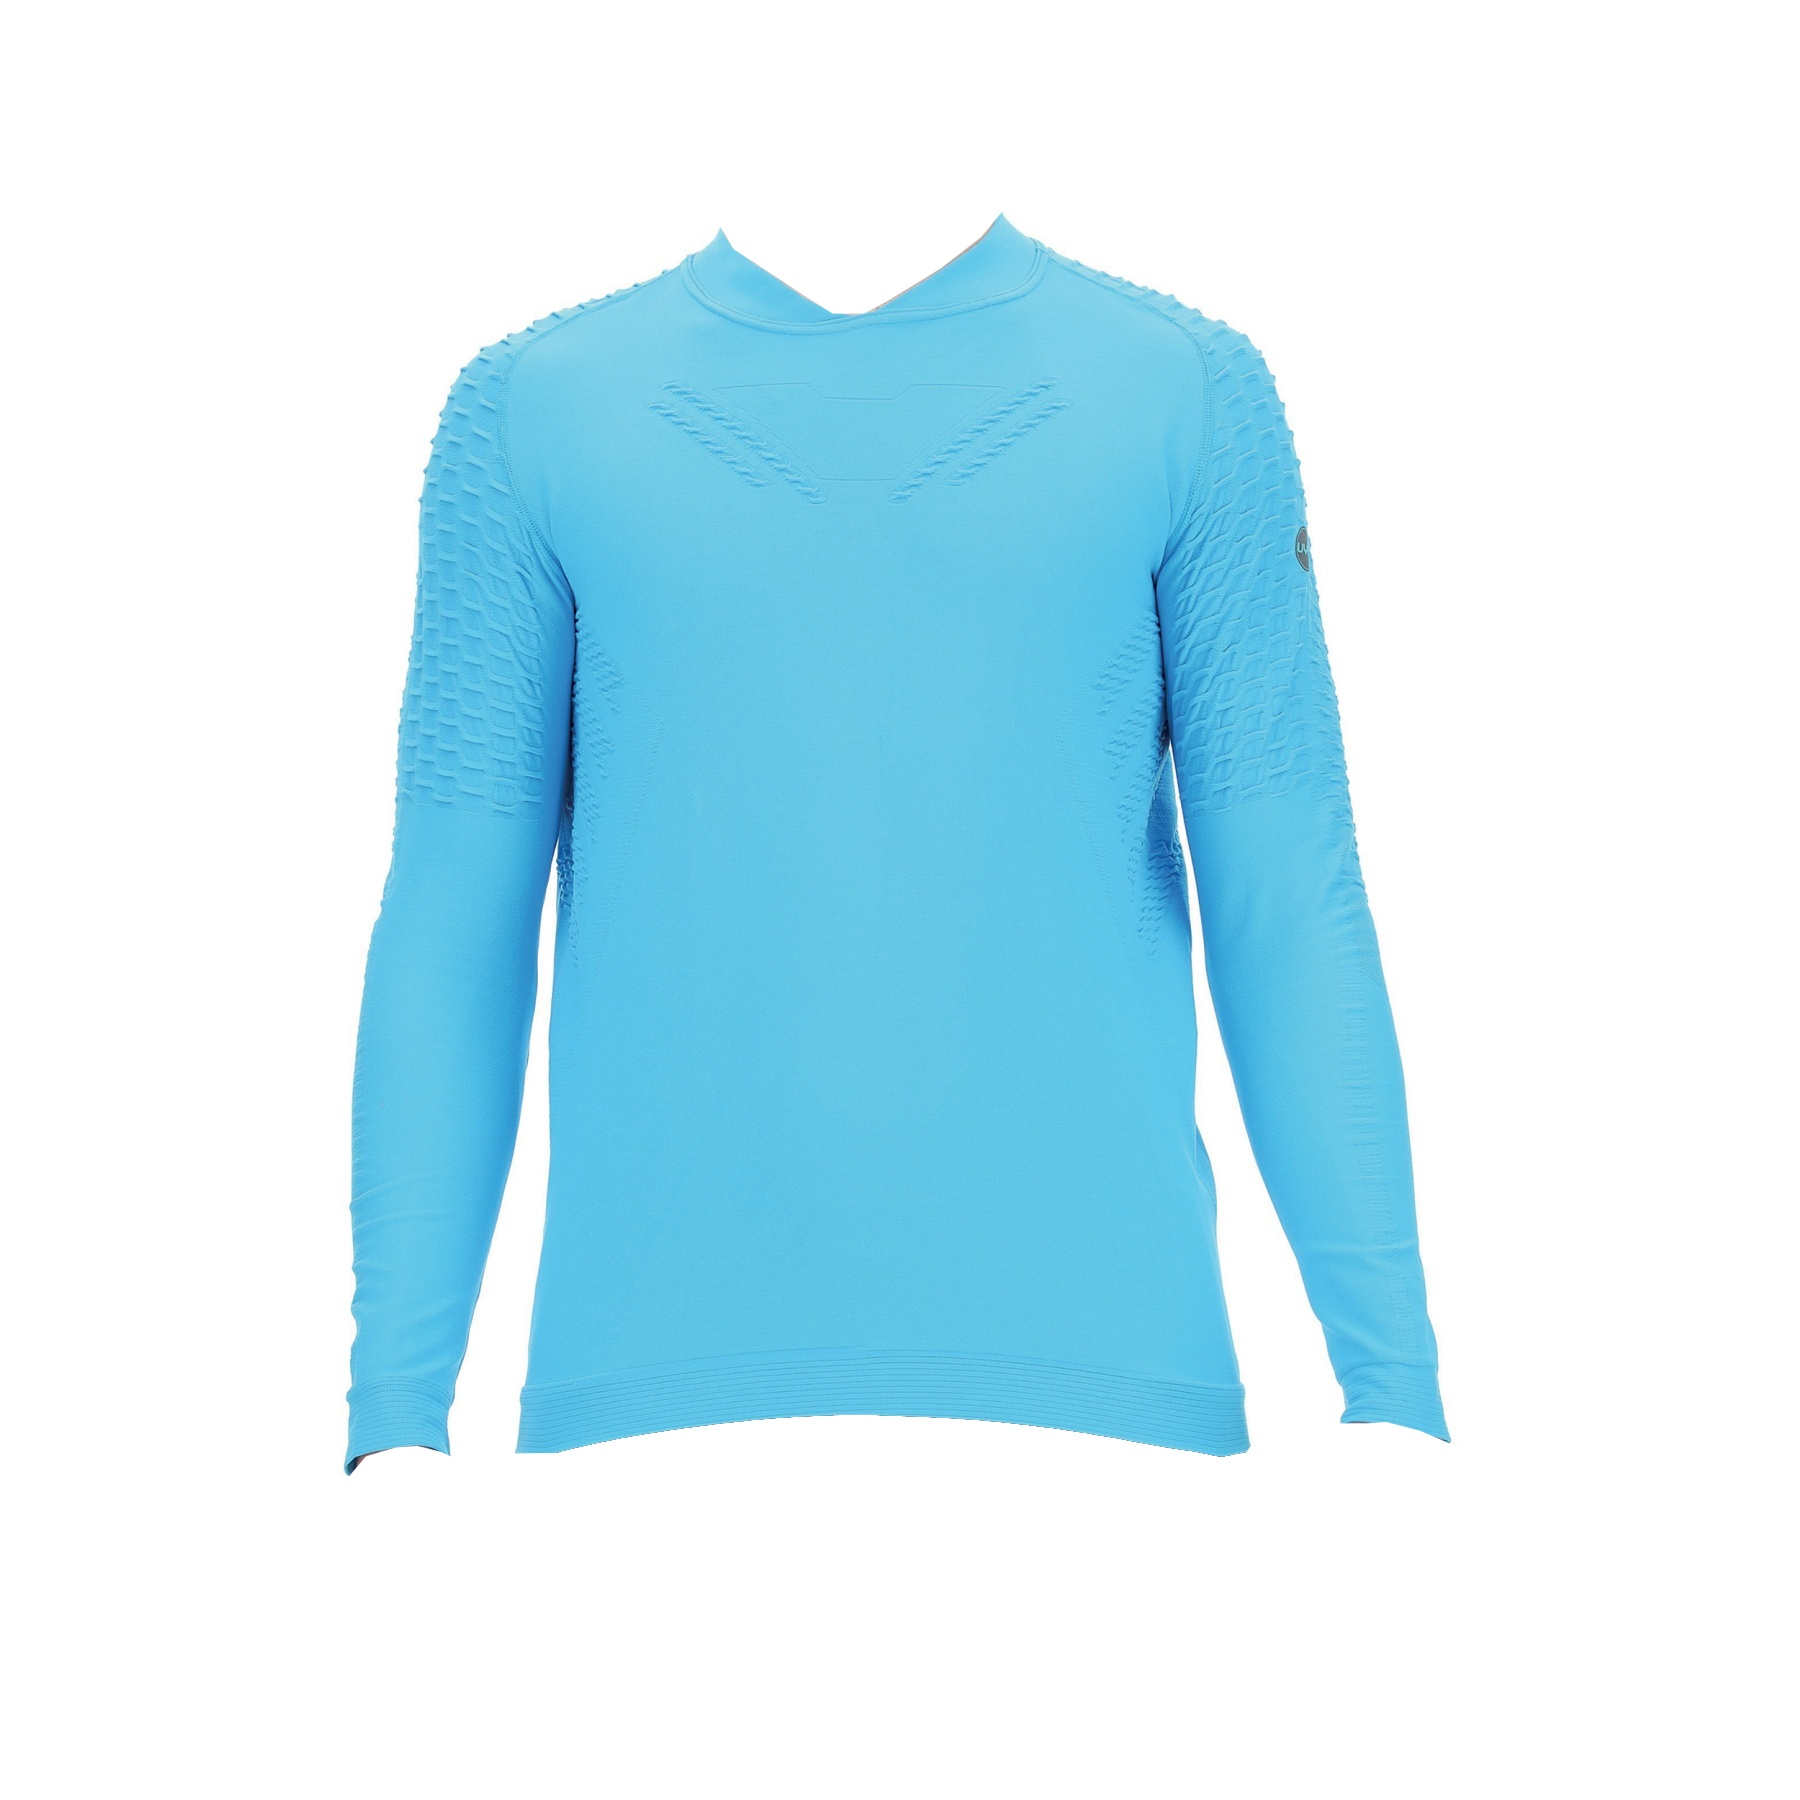 UYN City Running Longsleeve Shirt - Blue Danube